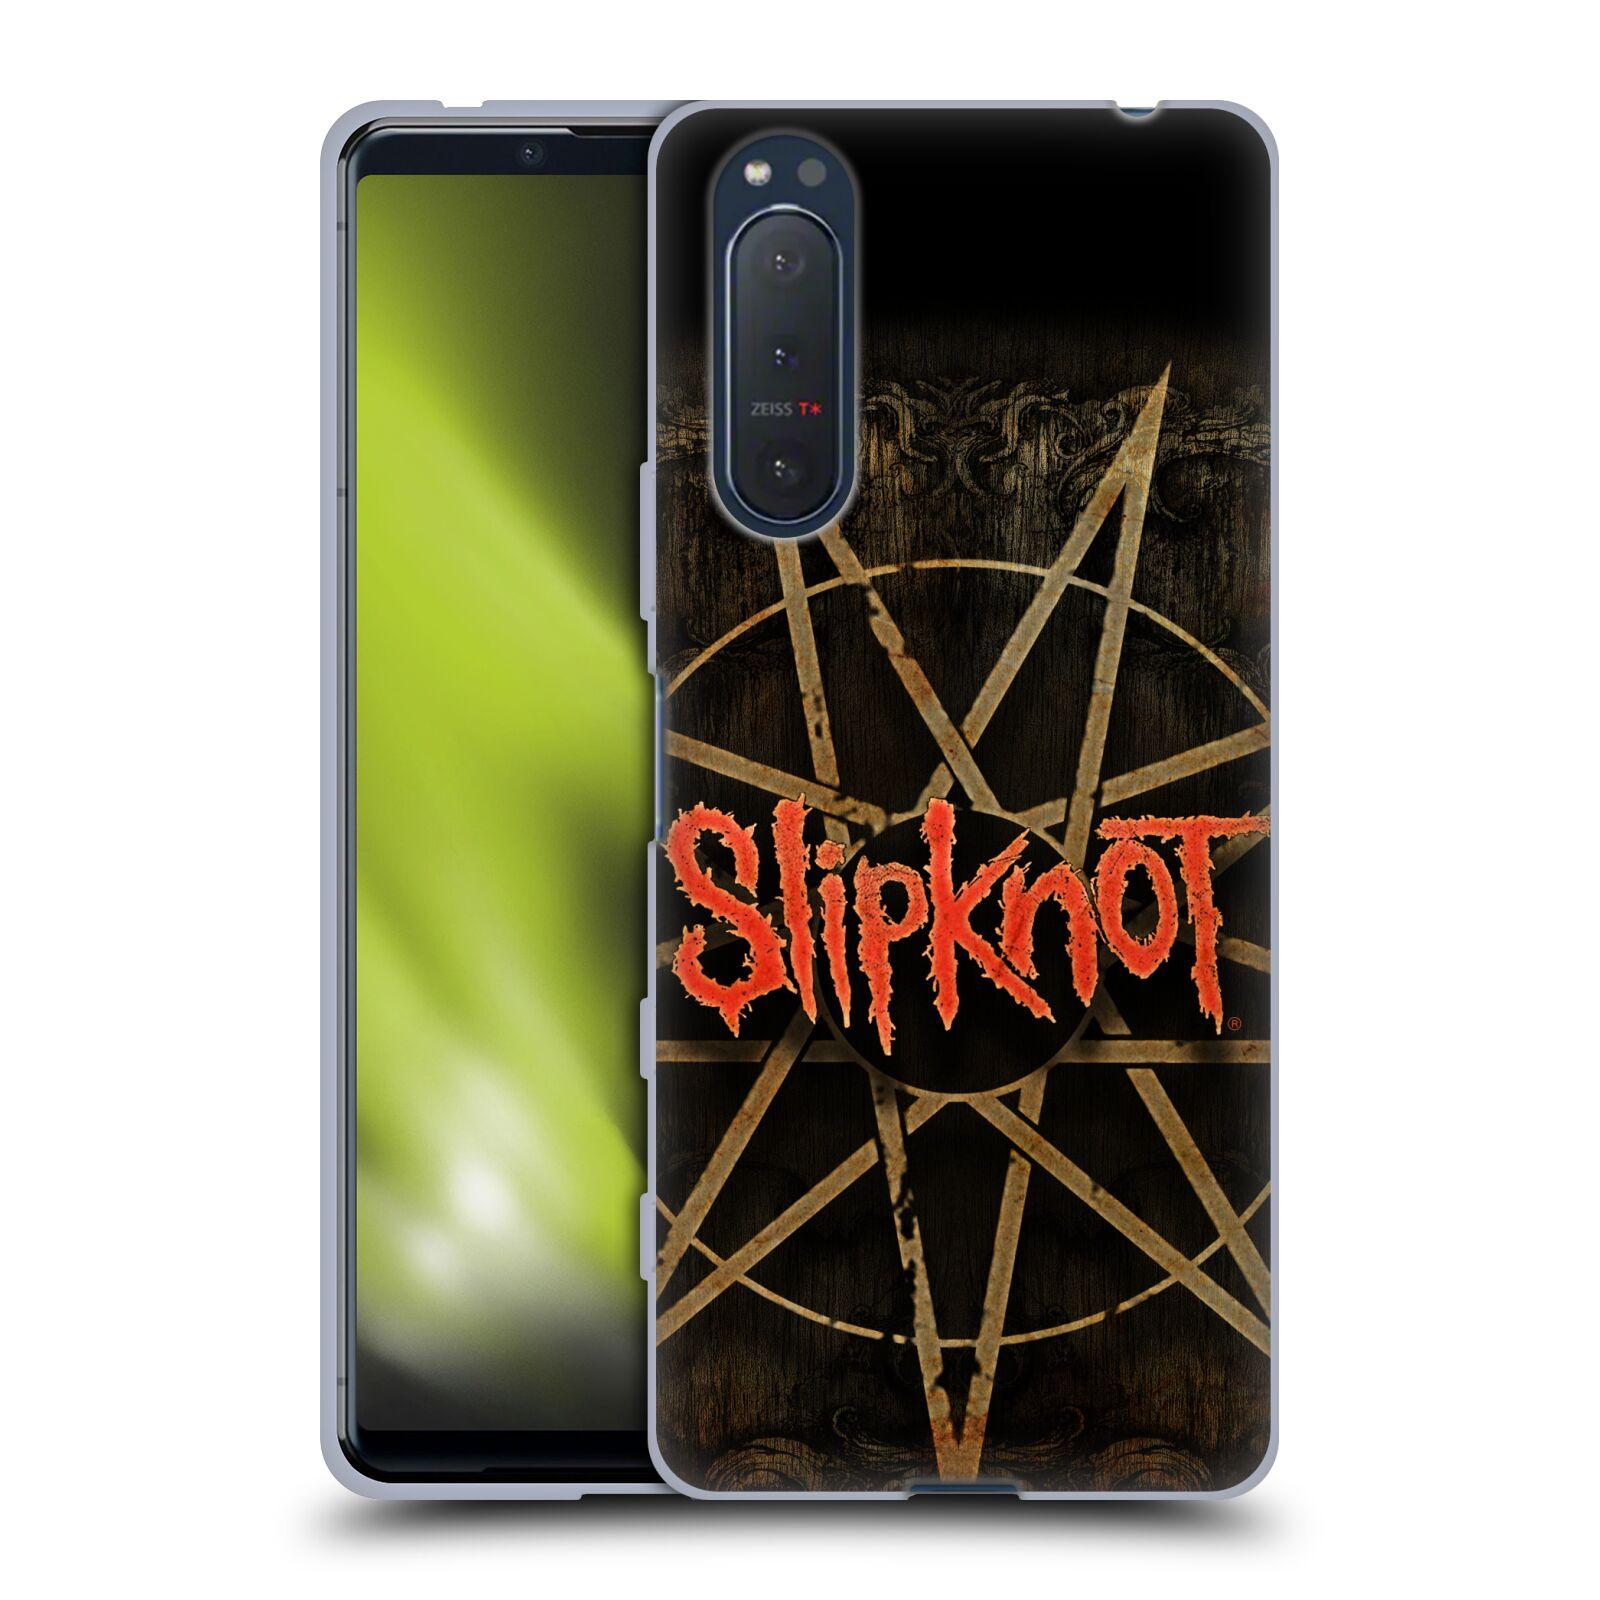 Silikonové pouzdro na mobil Sony Xperia 5 II - Head Case - Slipknot - Znak